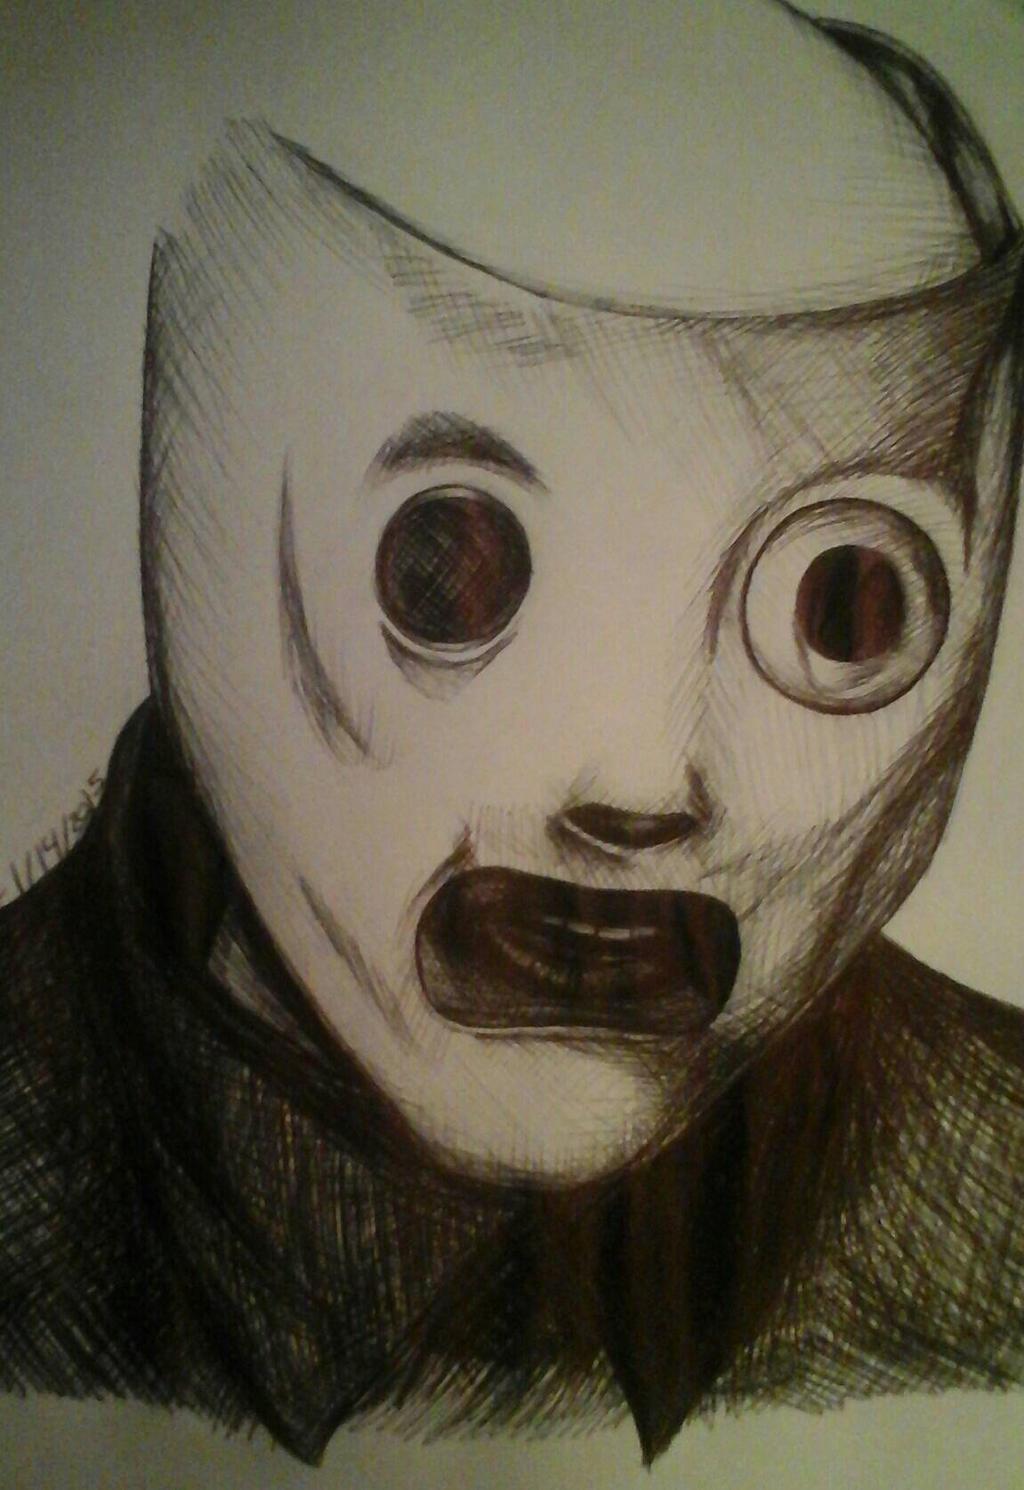 slipknot corey taylor mask ballpoint pen drawing by